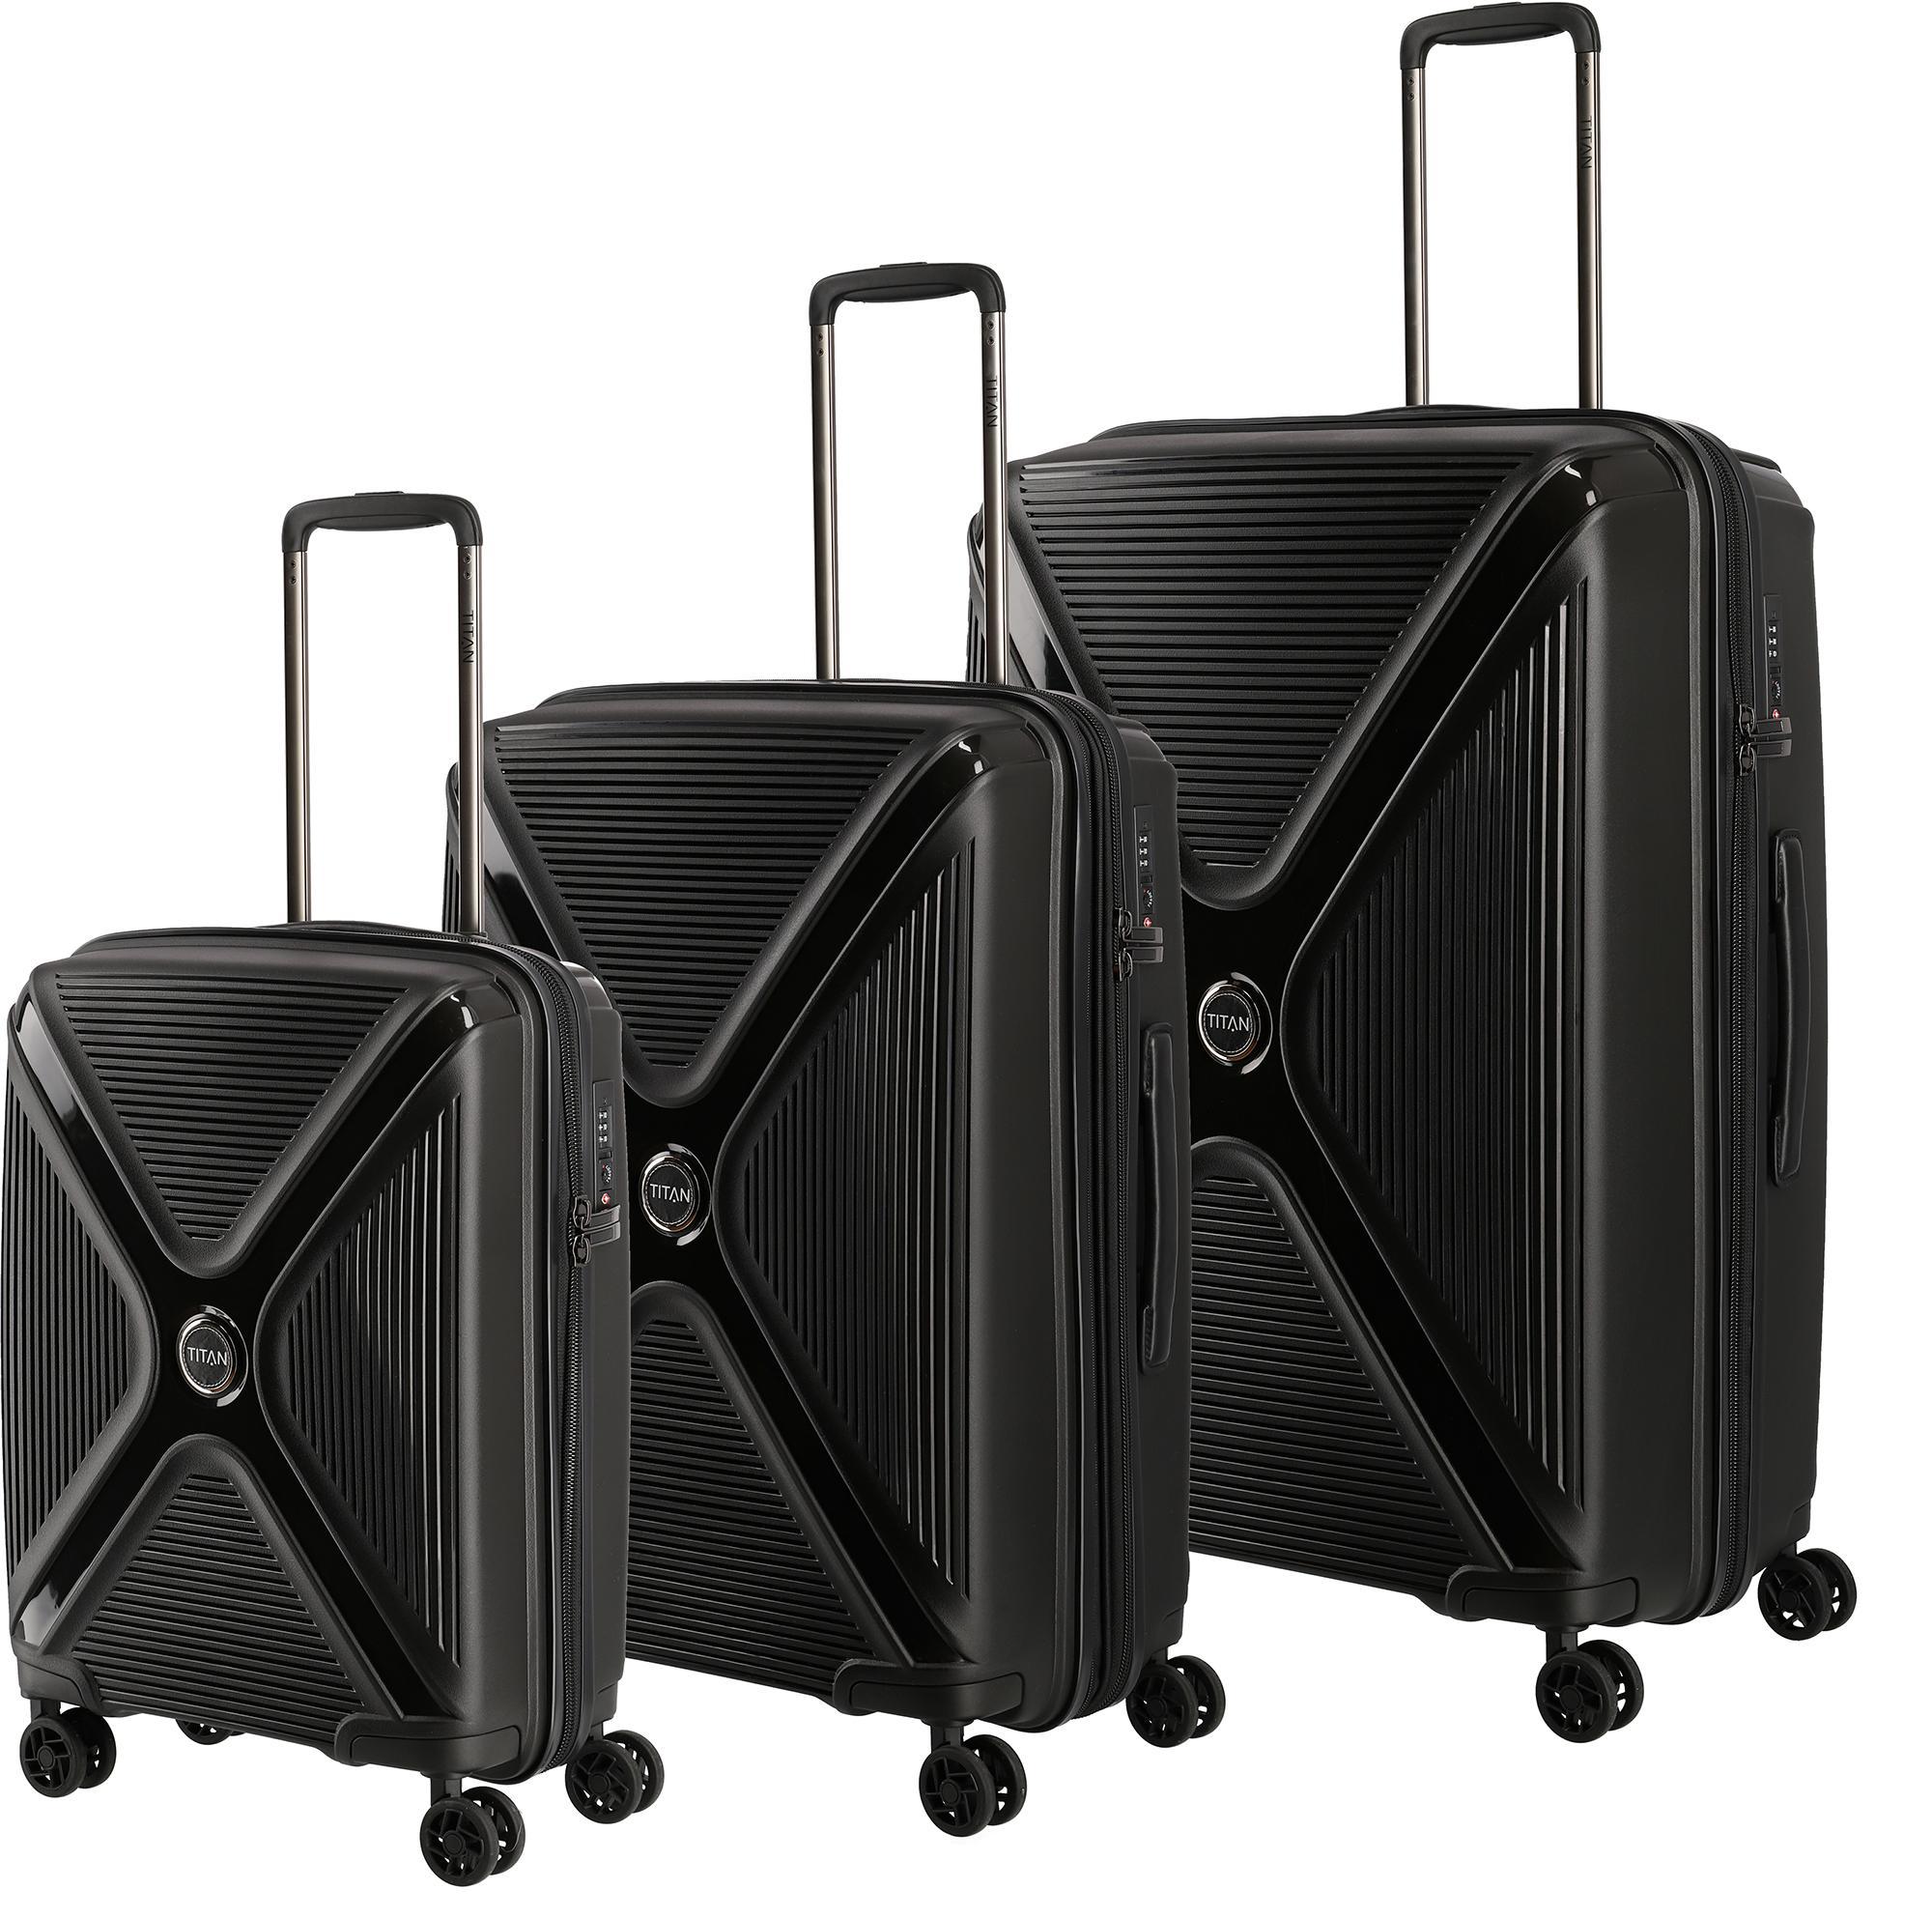 titan trolleyset paradoxx black uni 4 rollen 3tlg. Black Bedroom Furniture Sets. Home Design Ideas